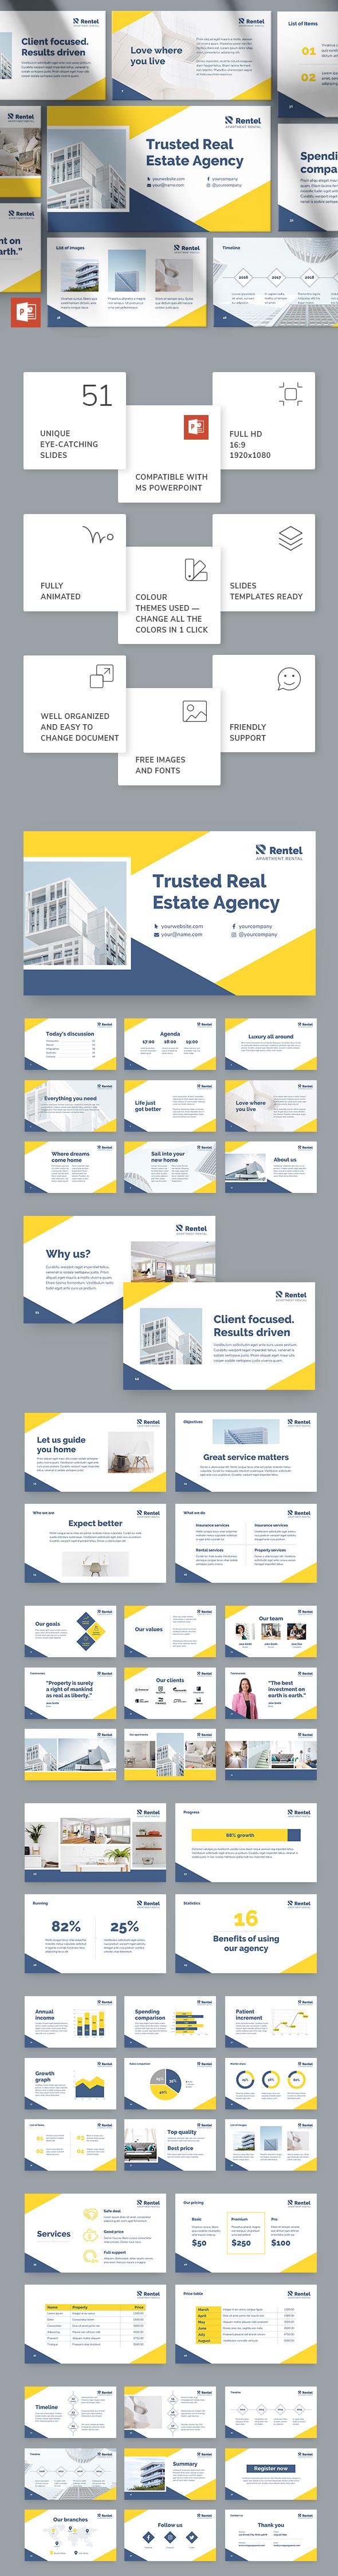 Apartment Rental PowerPoint Presentation Template